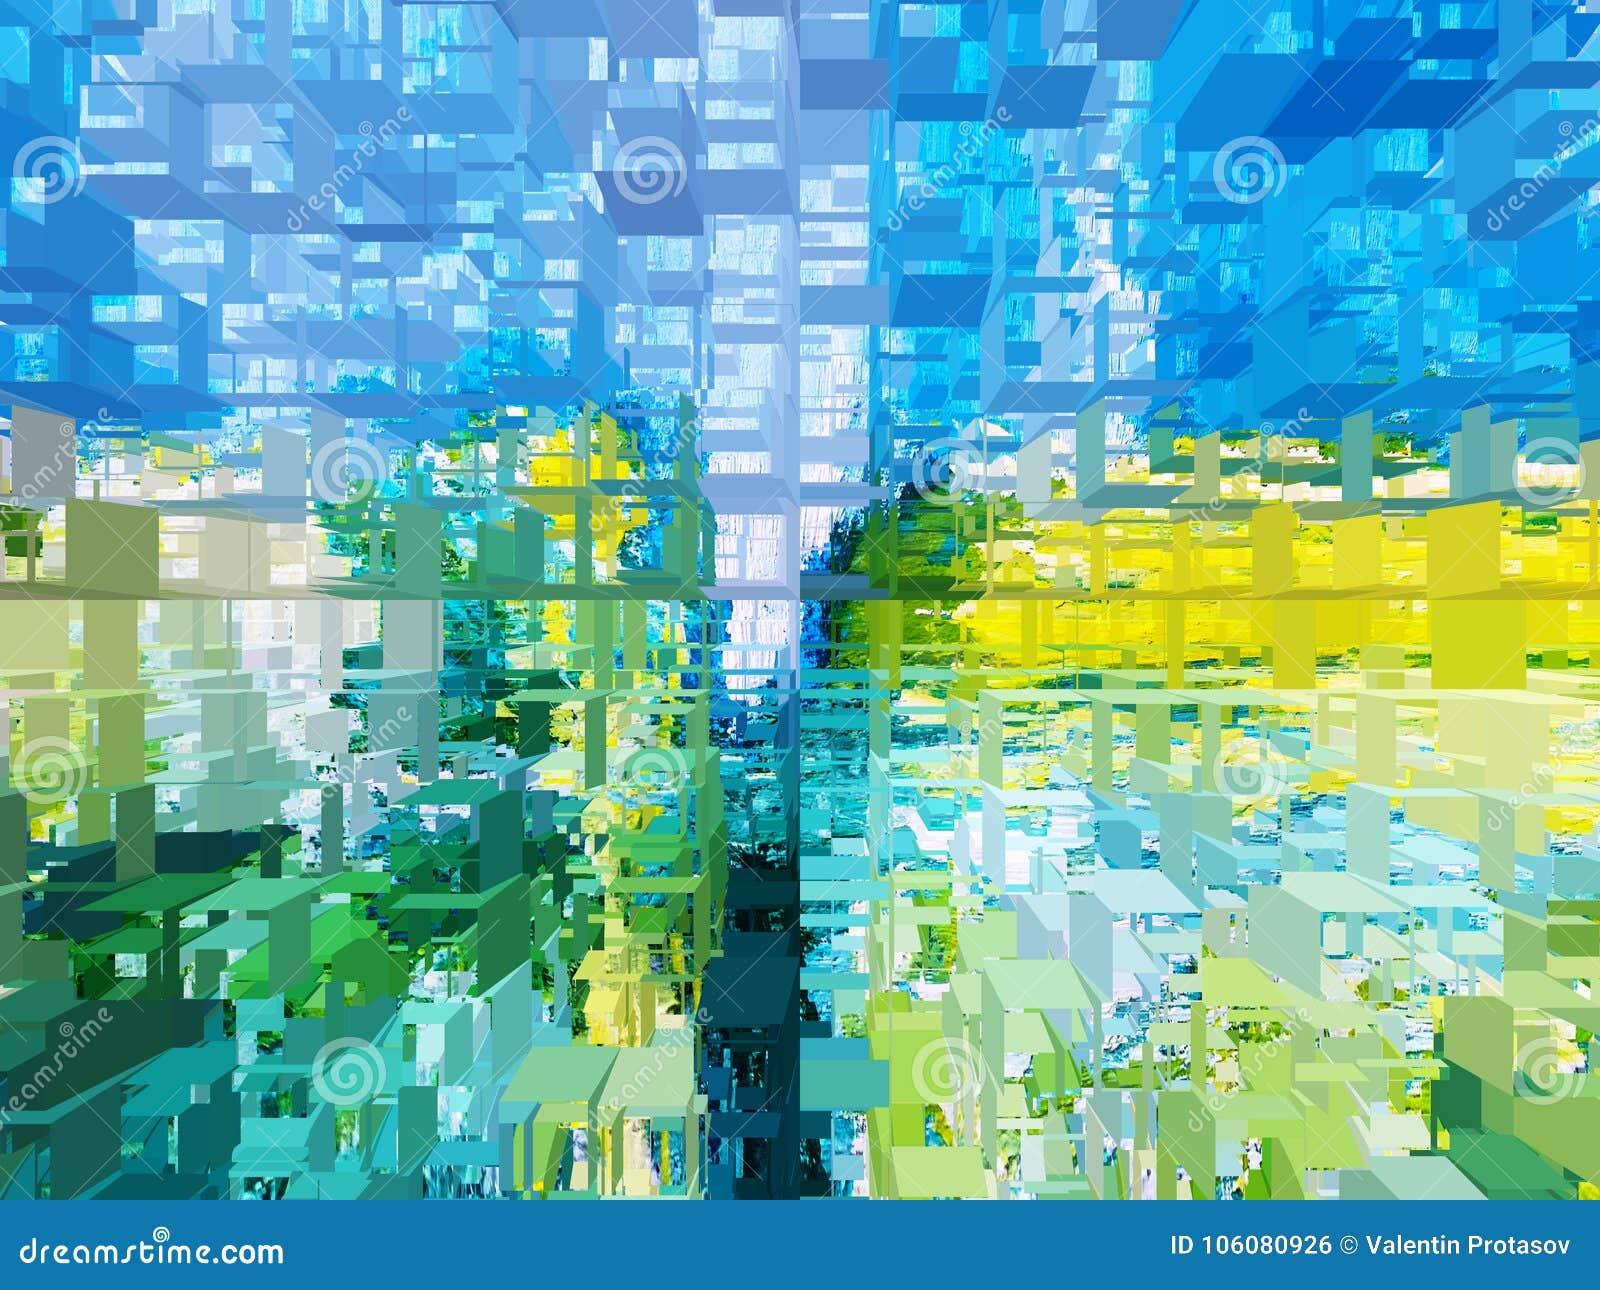 Abstrakcja Abstrakt struktura _ jedyność abstrakcje abstrakty tekstury